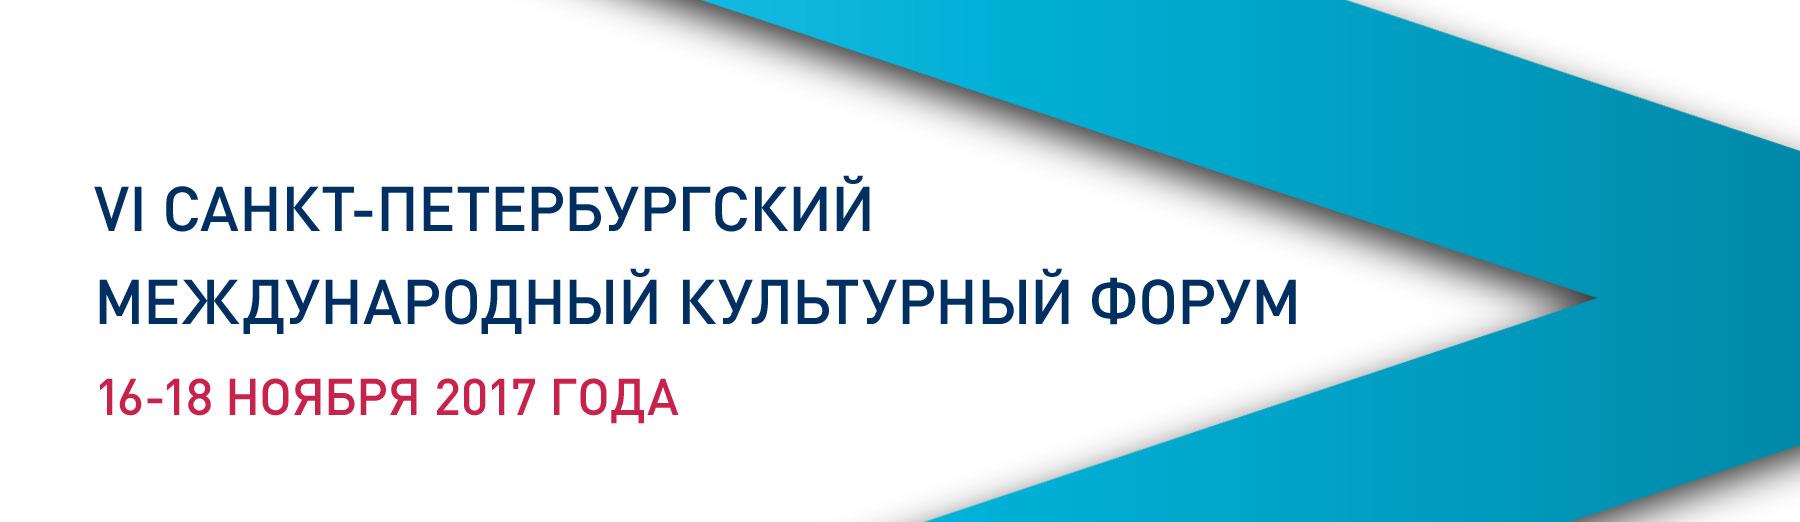 VI Международный культурный форум